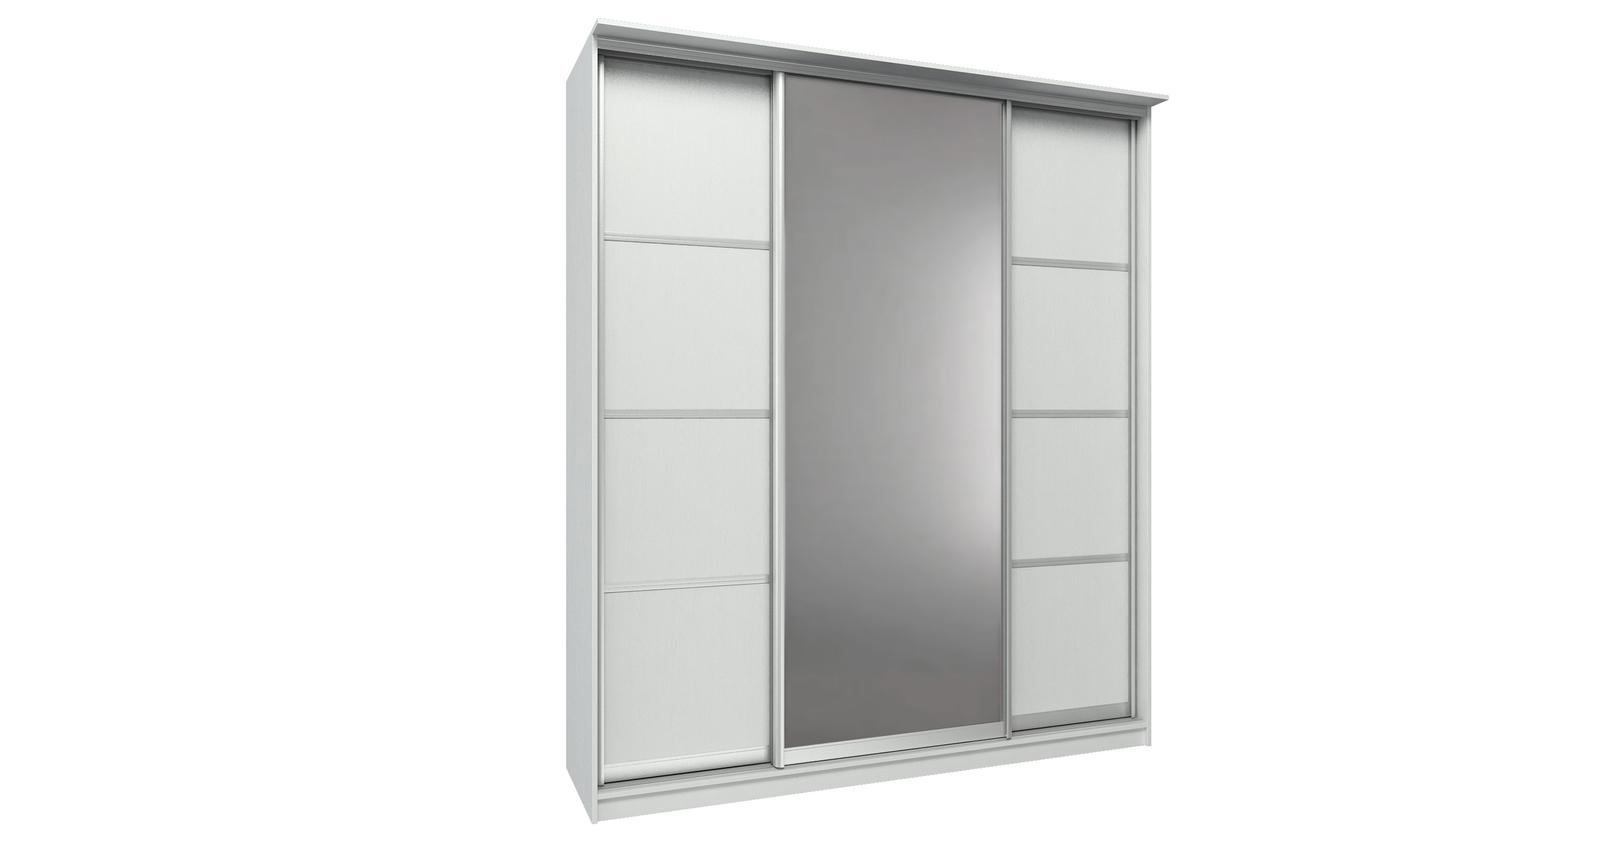 Шкаф-купе трехдверный Манчестер 205 см (белый+зеркало)